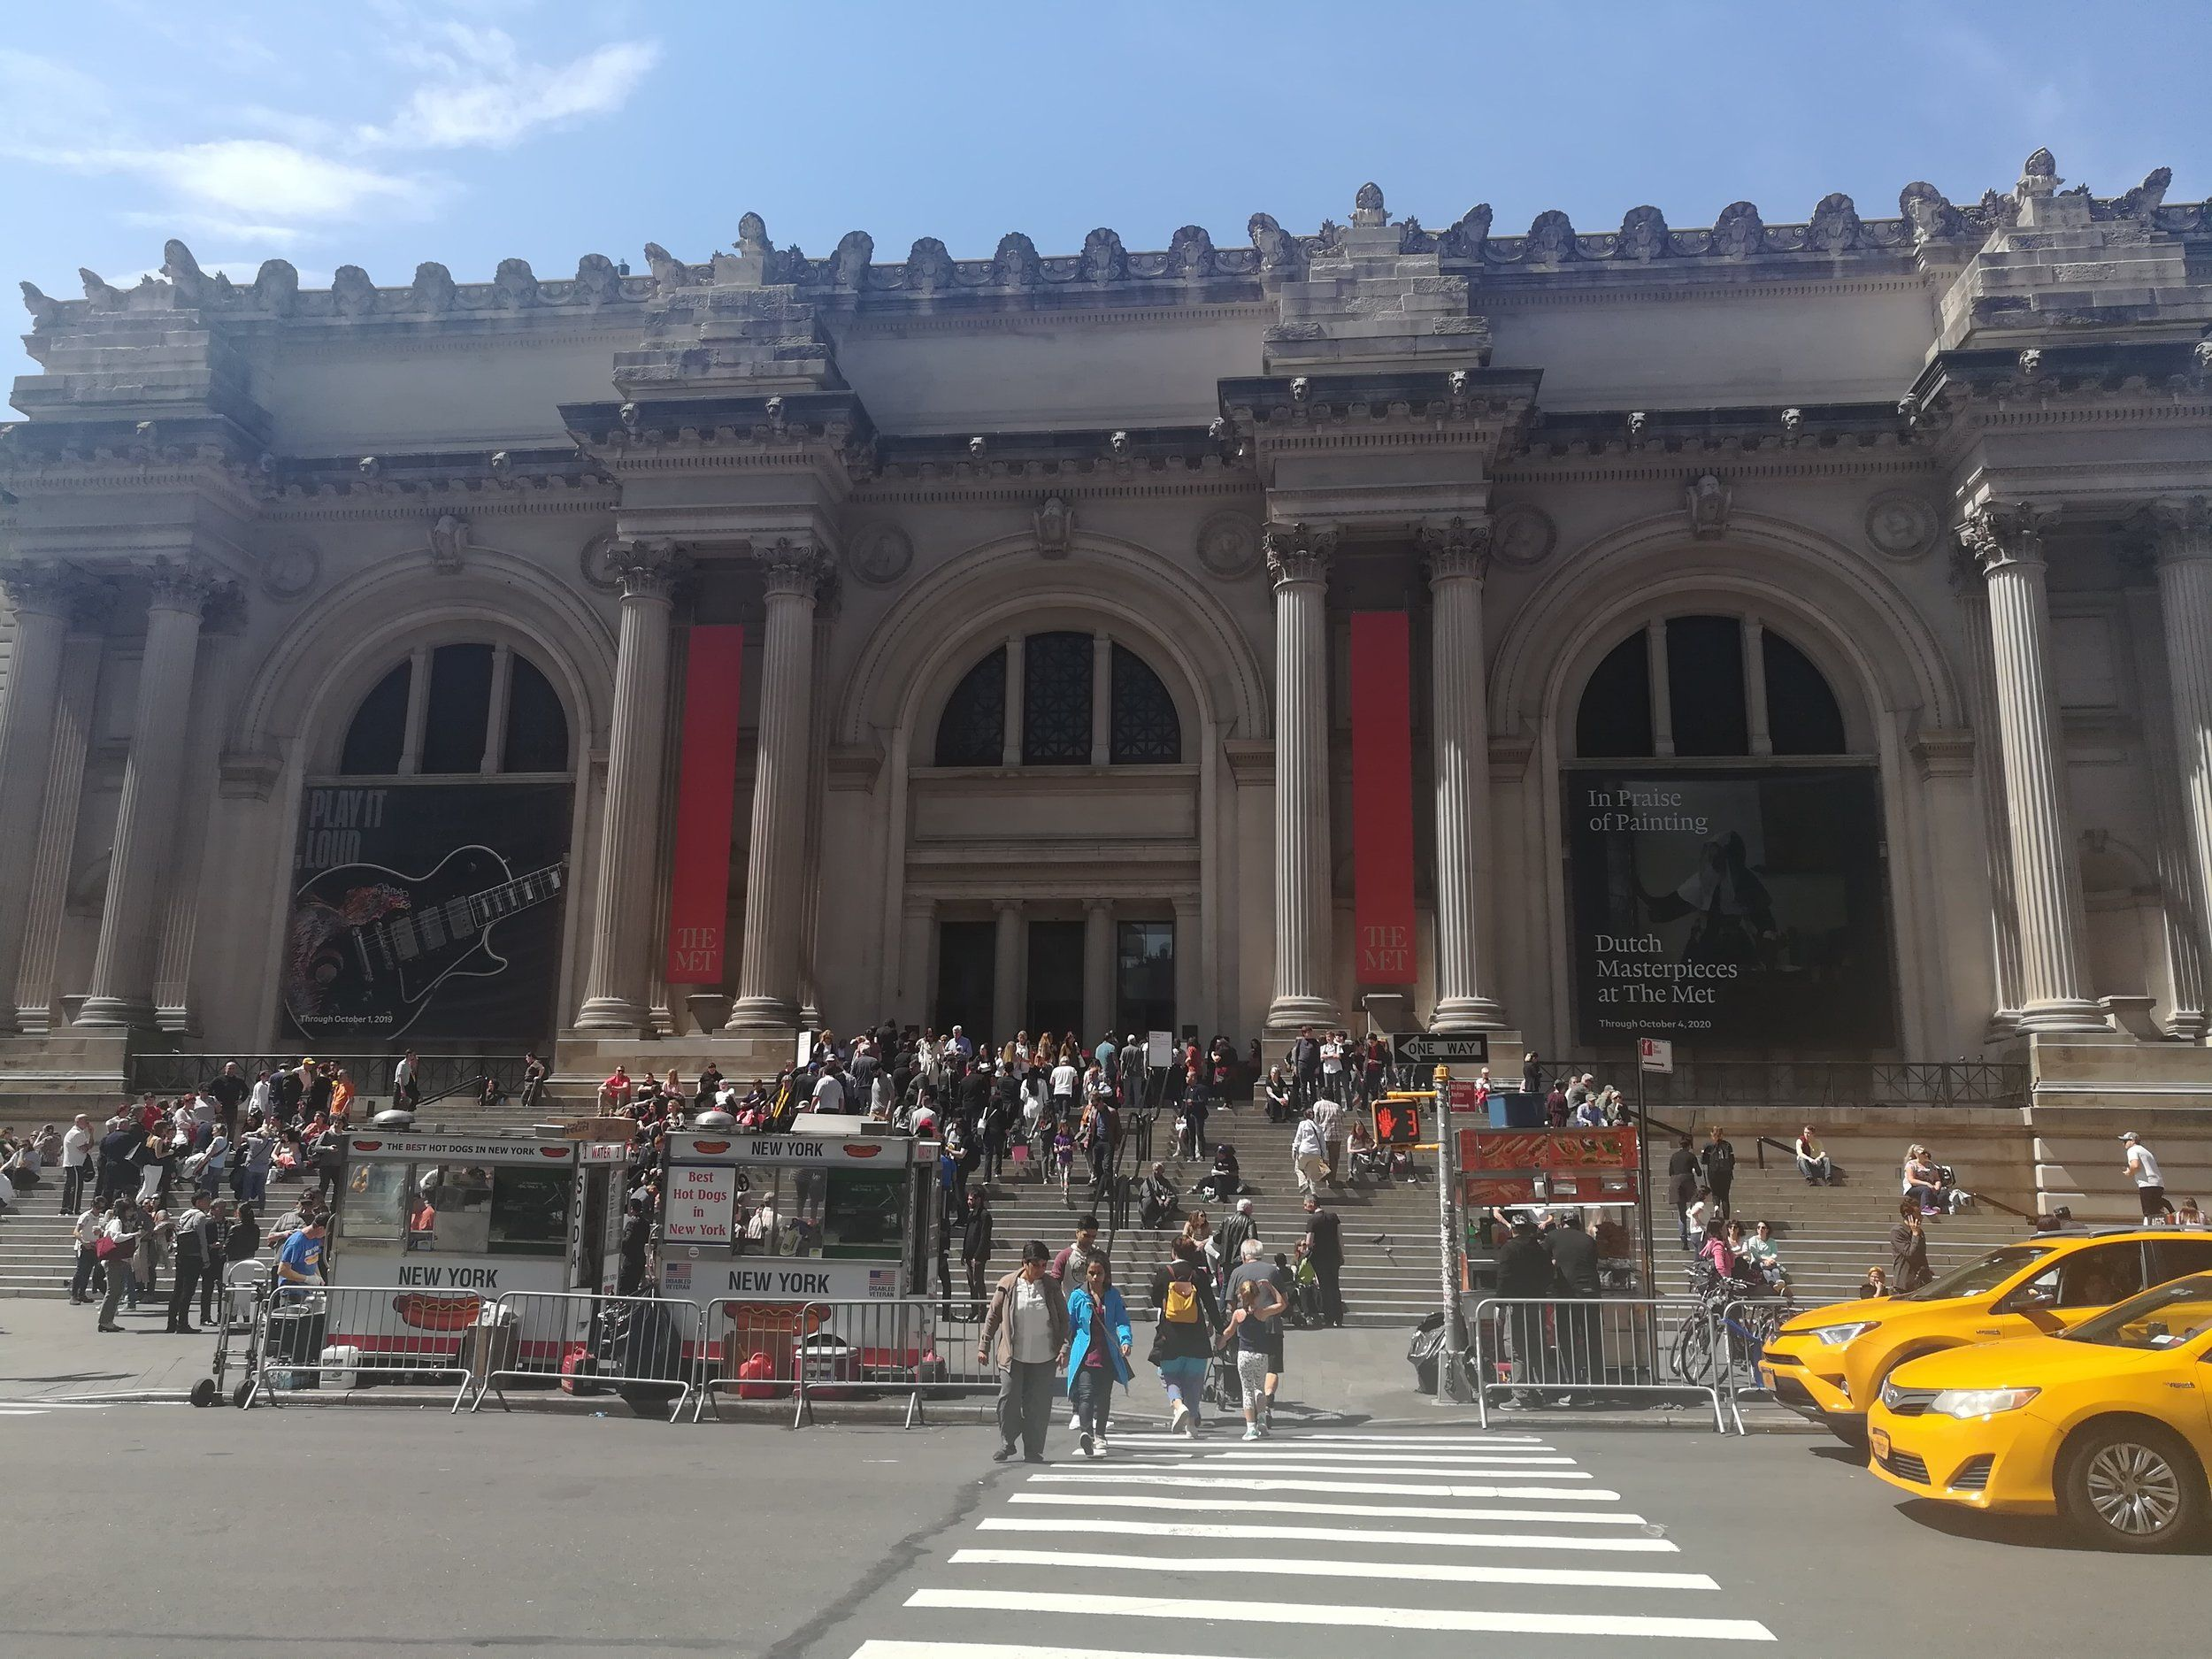 Have We Met Before Guide To Visiting The Metropolitan Museum Of Art With Images Metropolitan Museum Metropolitan Museum Of Art Met Museum